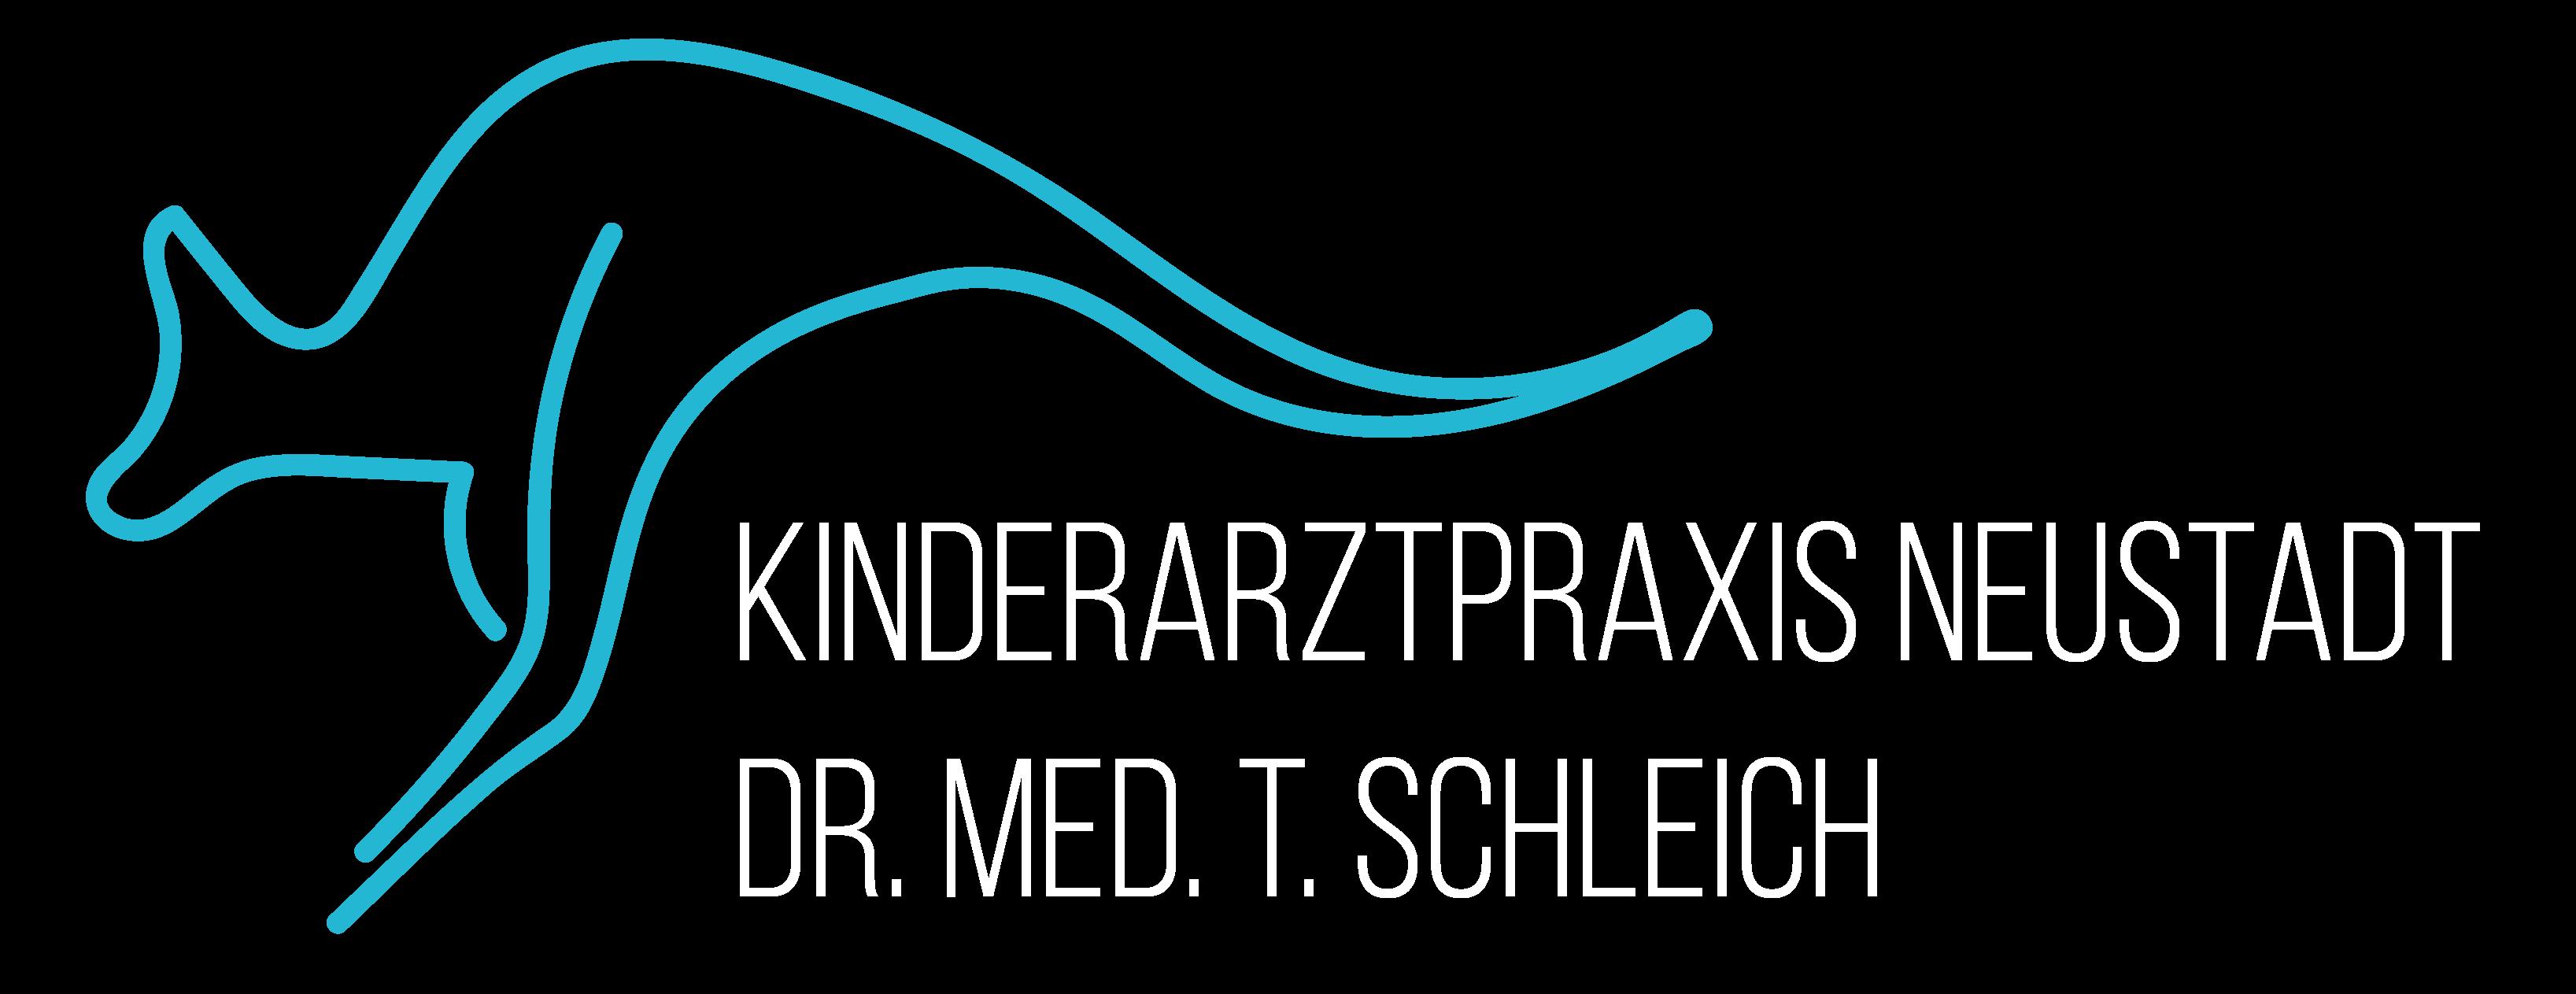 Kinderarztpraxis Neustadt - Kinderarzt in Luzern